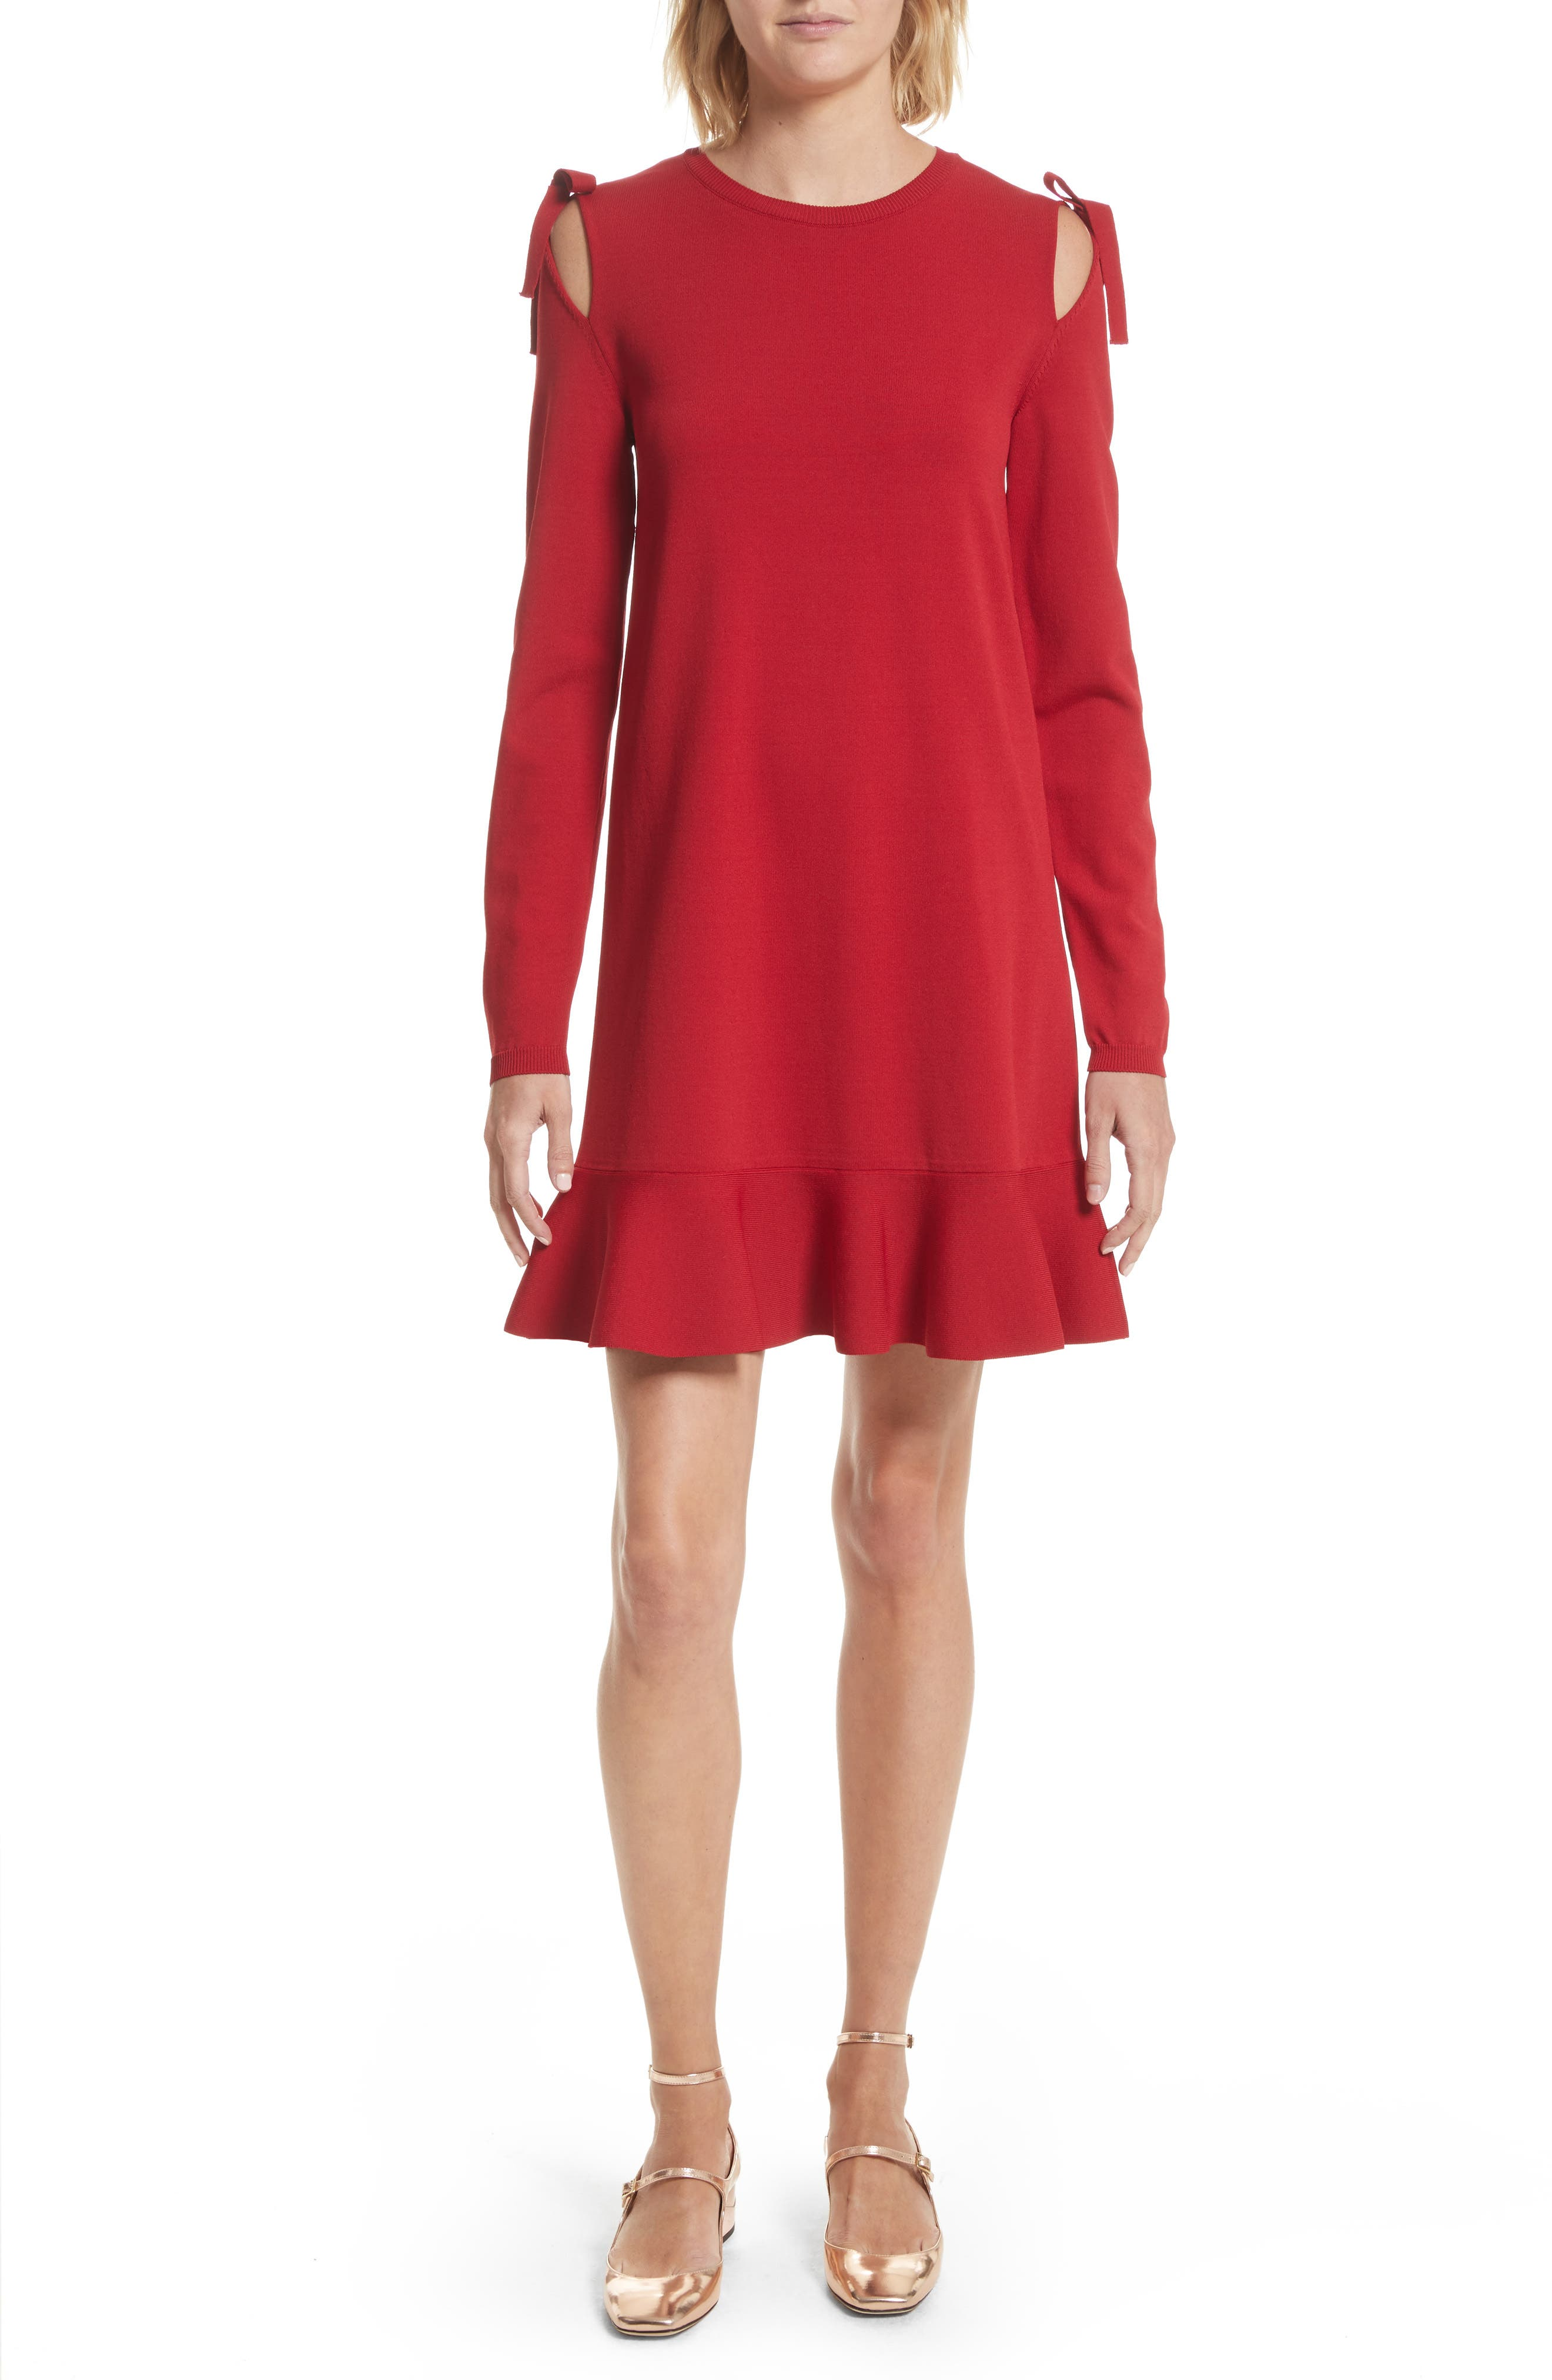 Main Image - RED Valentino Bow Knit Dress